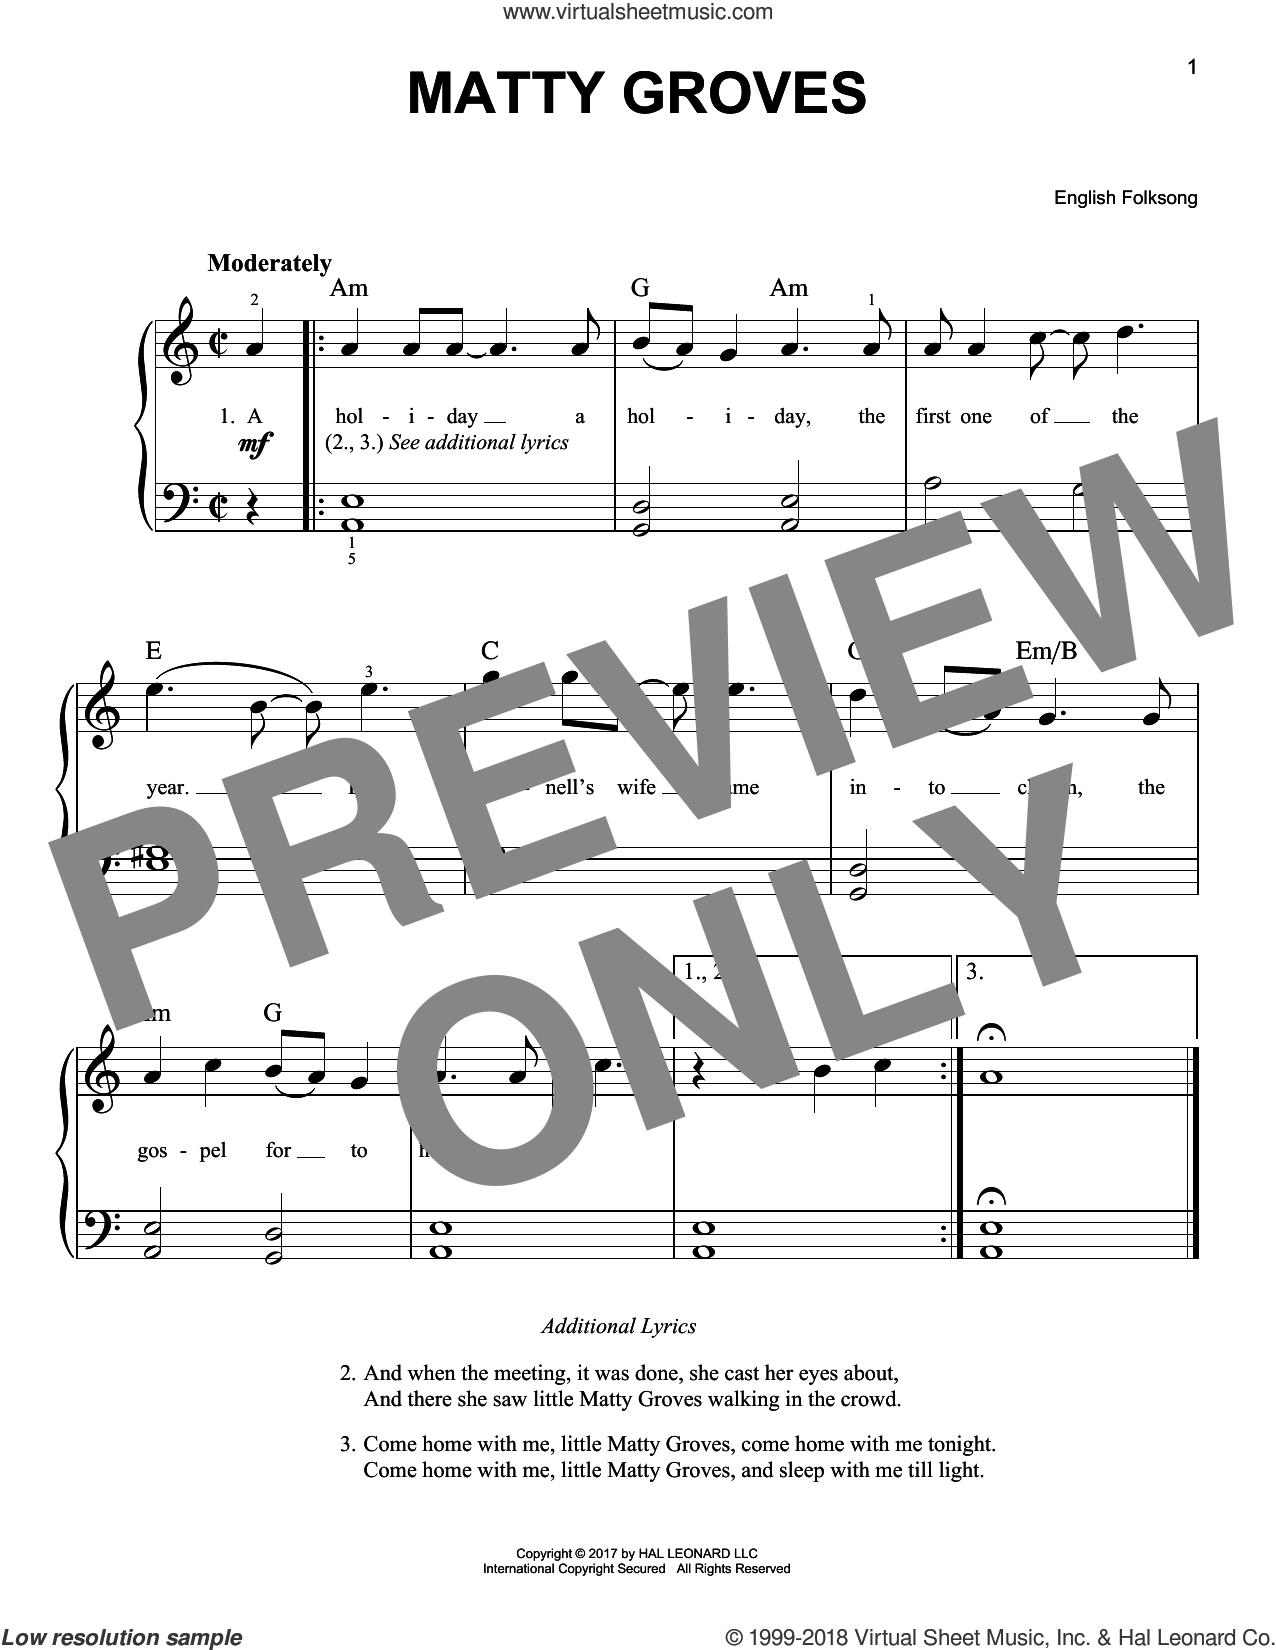 Matty Groves sheet music for piano solo, beginner skill level